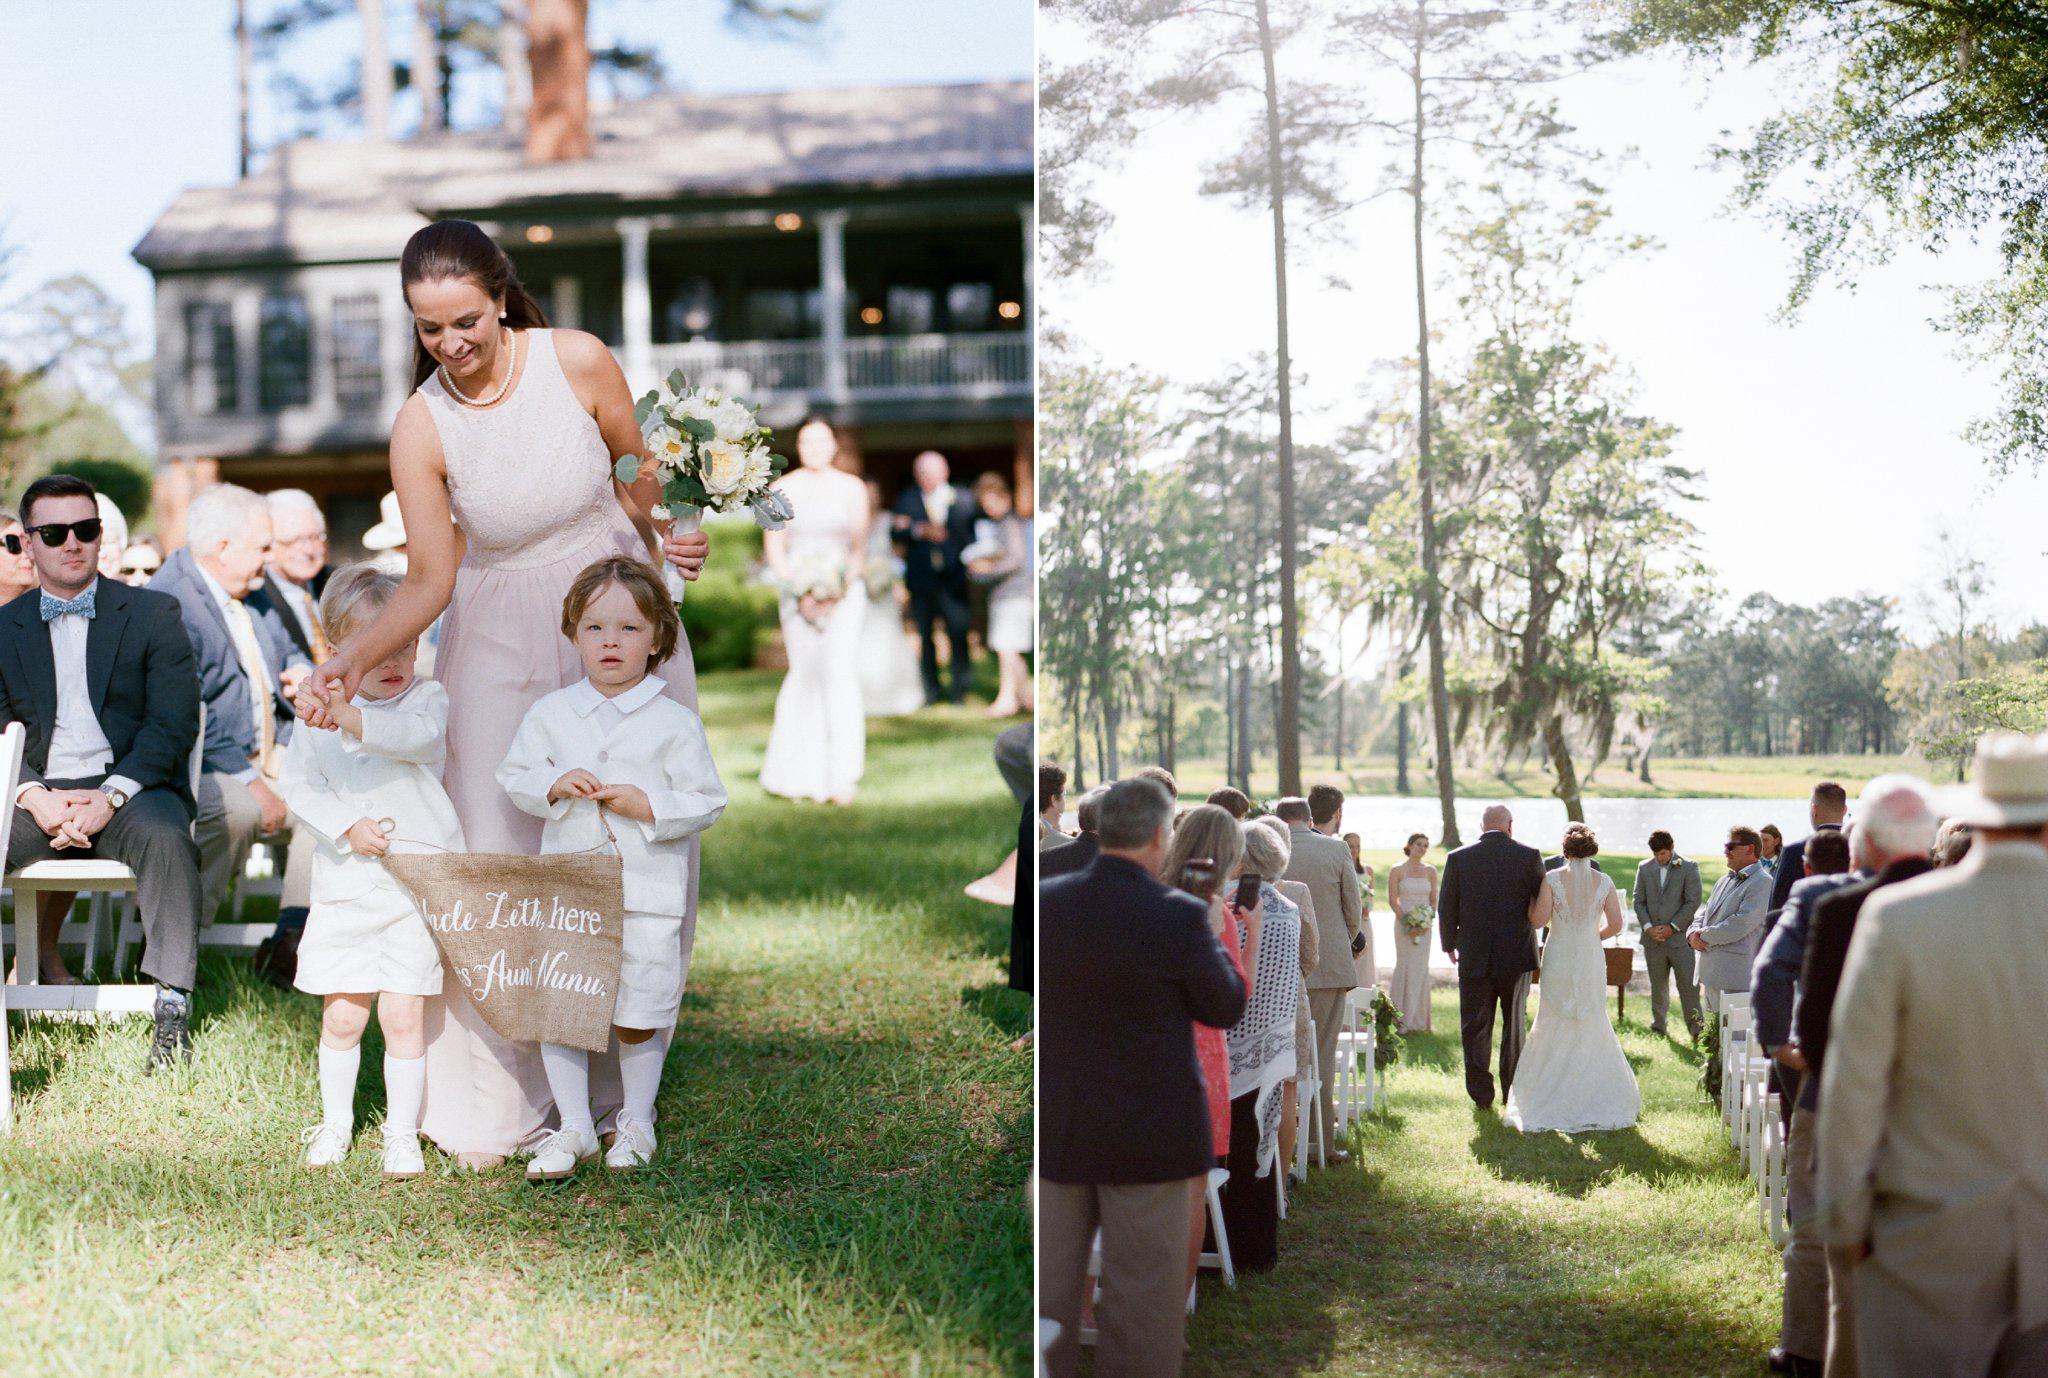 ecila farm wedding albany georgia wedding photographer shannon griffin photography-59.jpg